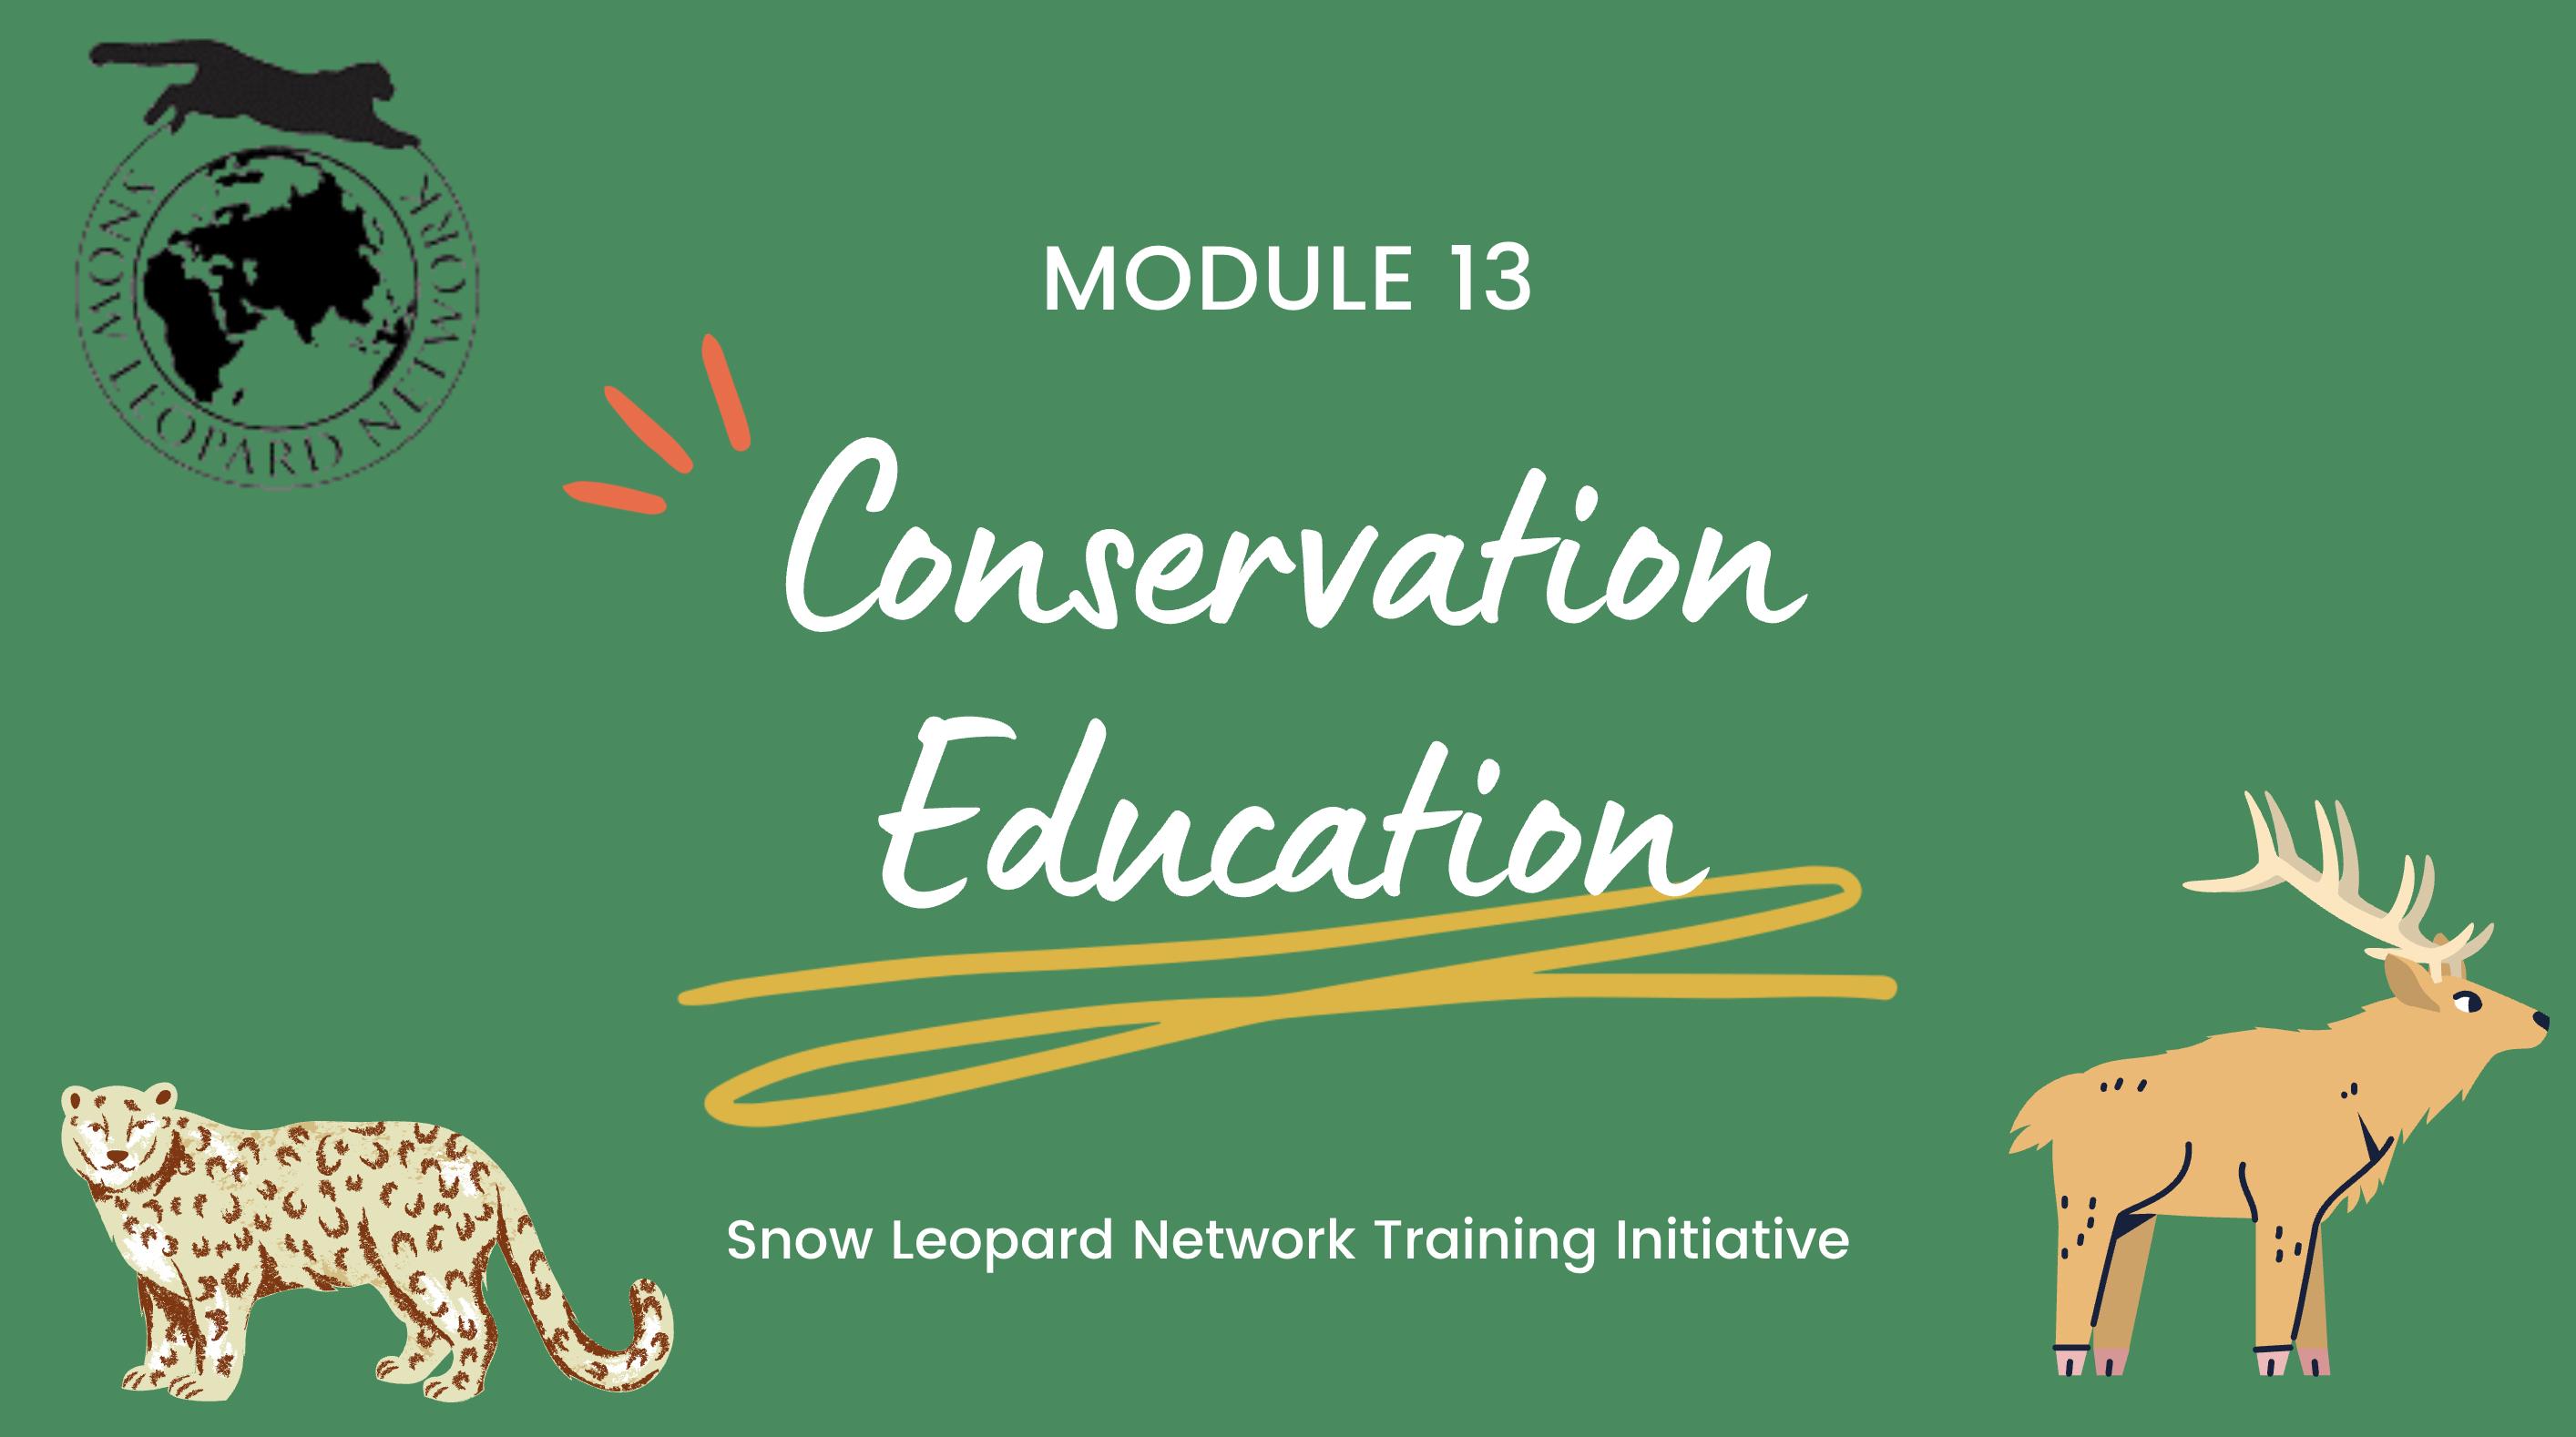 Module 13: Conservation Education